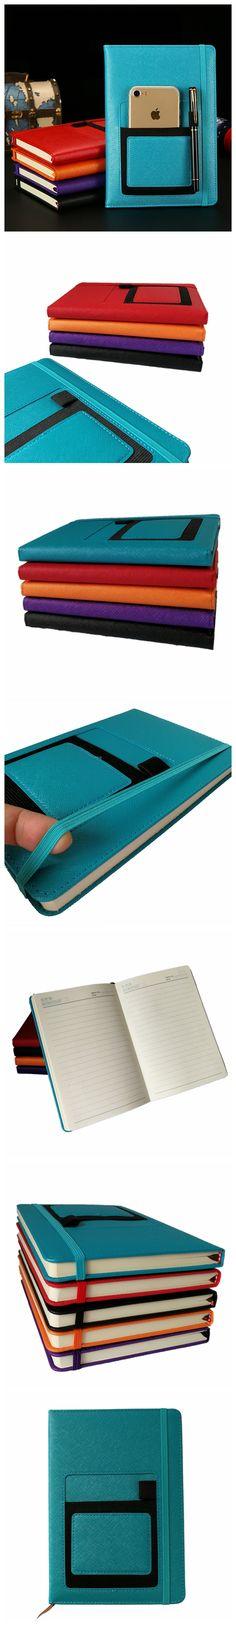 Paperchase Deboss Floral Outline Pocket Organiser Pattern Pen Loop New Box Blue